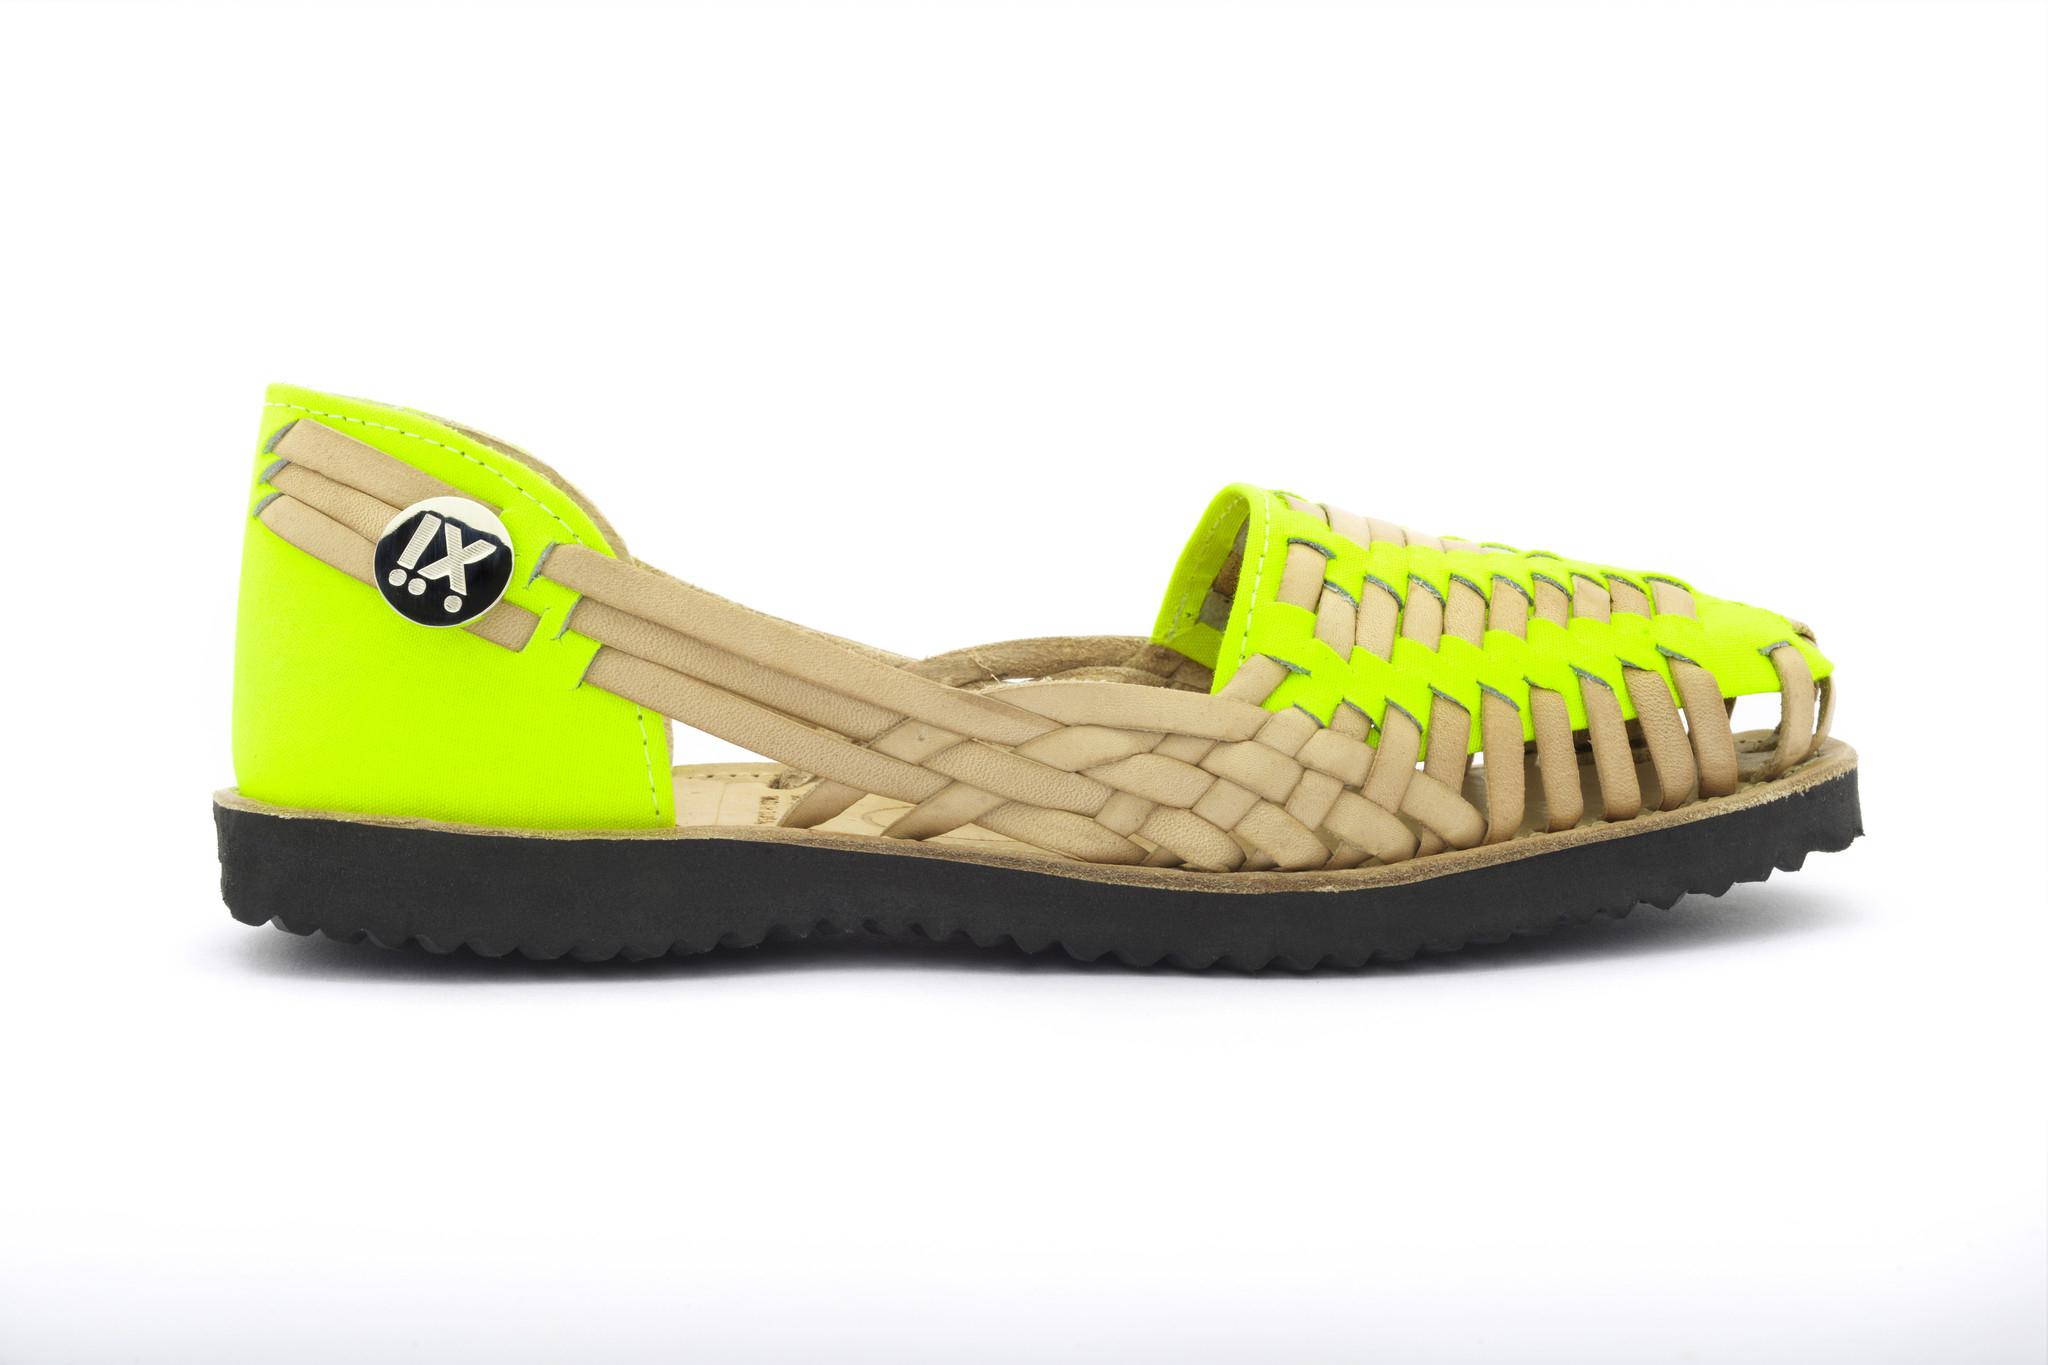 Ix Style Women'S Neon Yellow Woven Leather Huarache Sandal ...